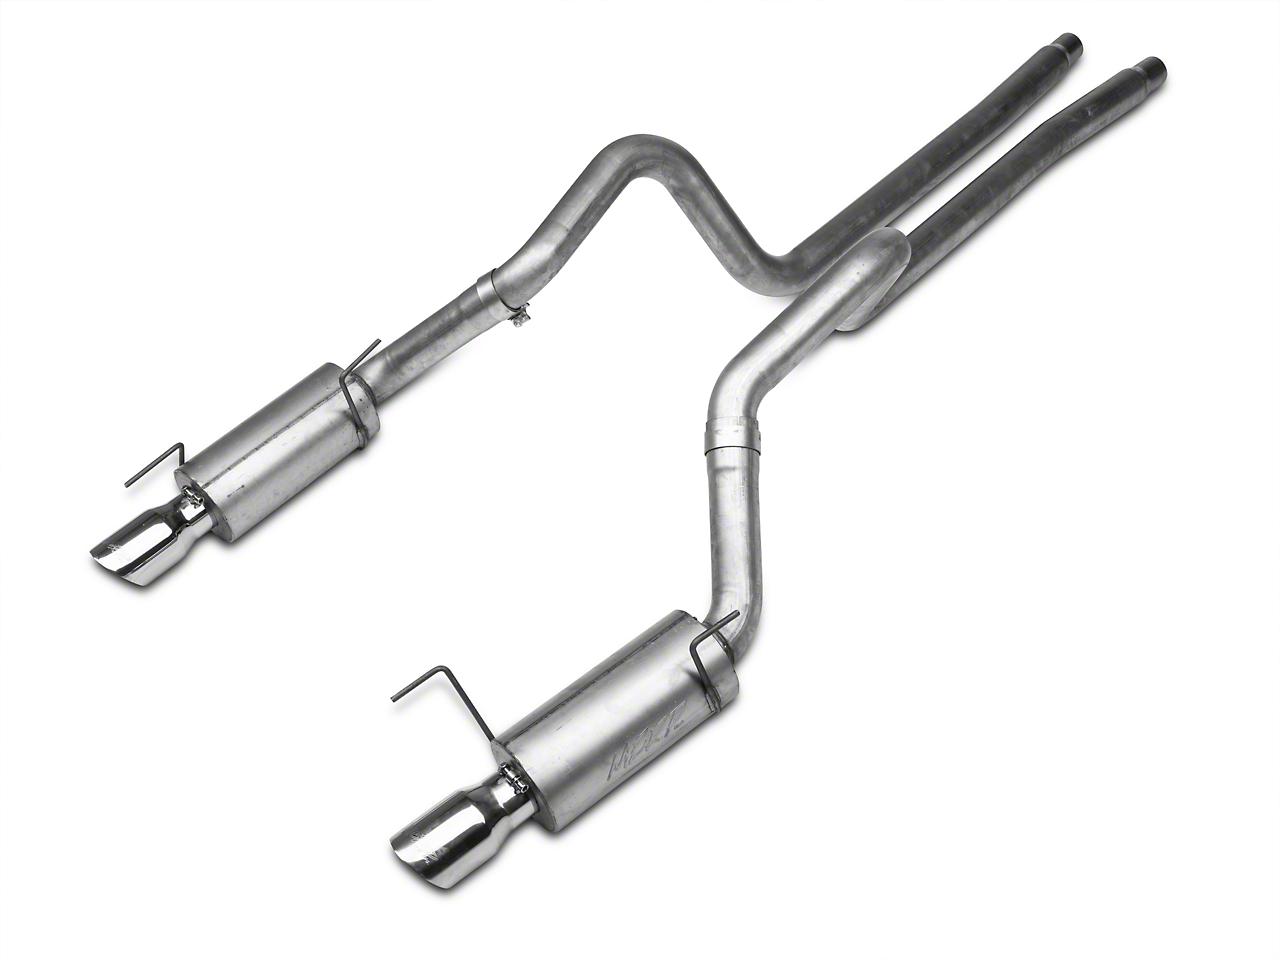 MBRP Street Cat-Back Exhaust - Aluminized (05-09 GT; 07-10 GT500)